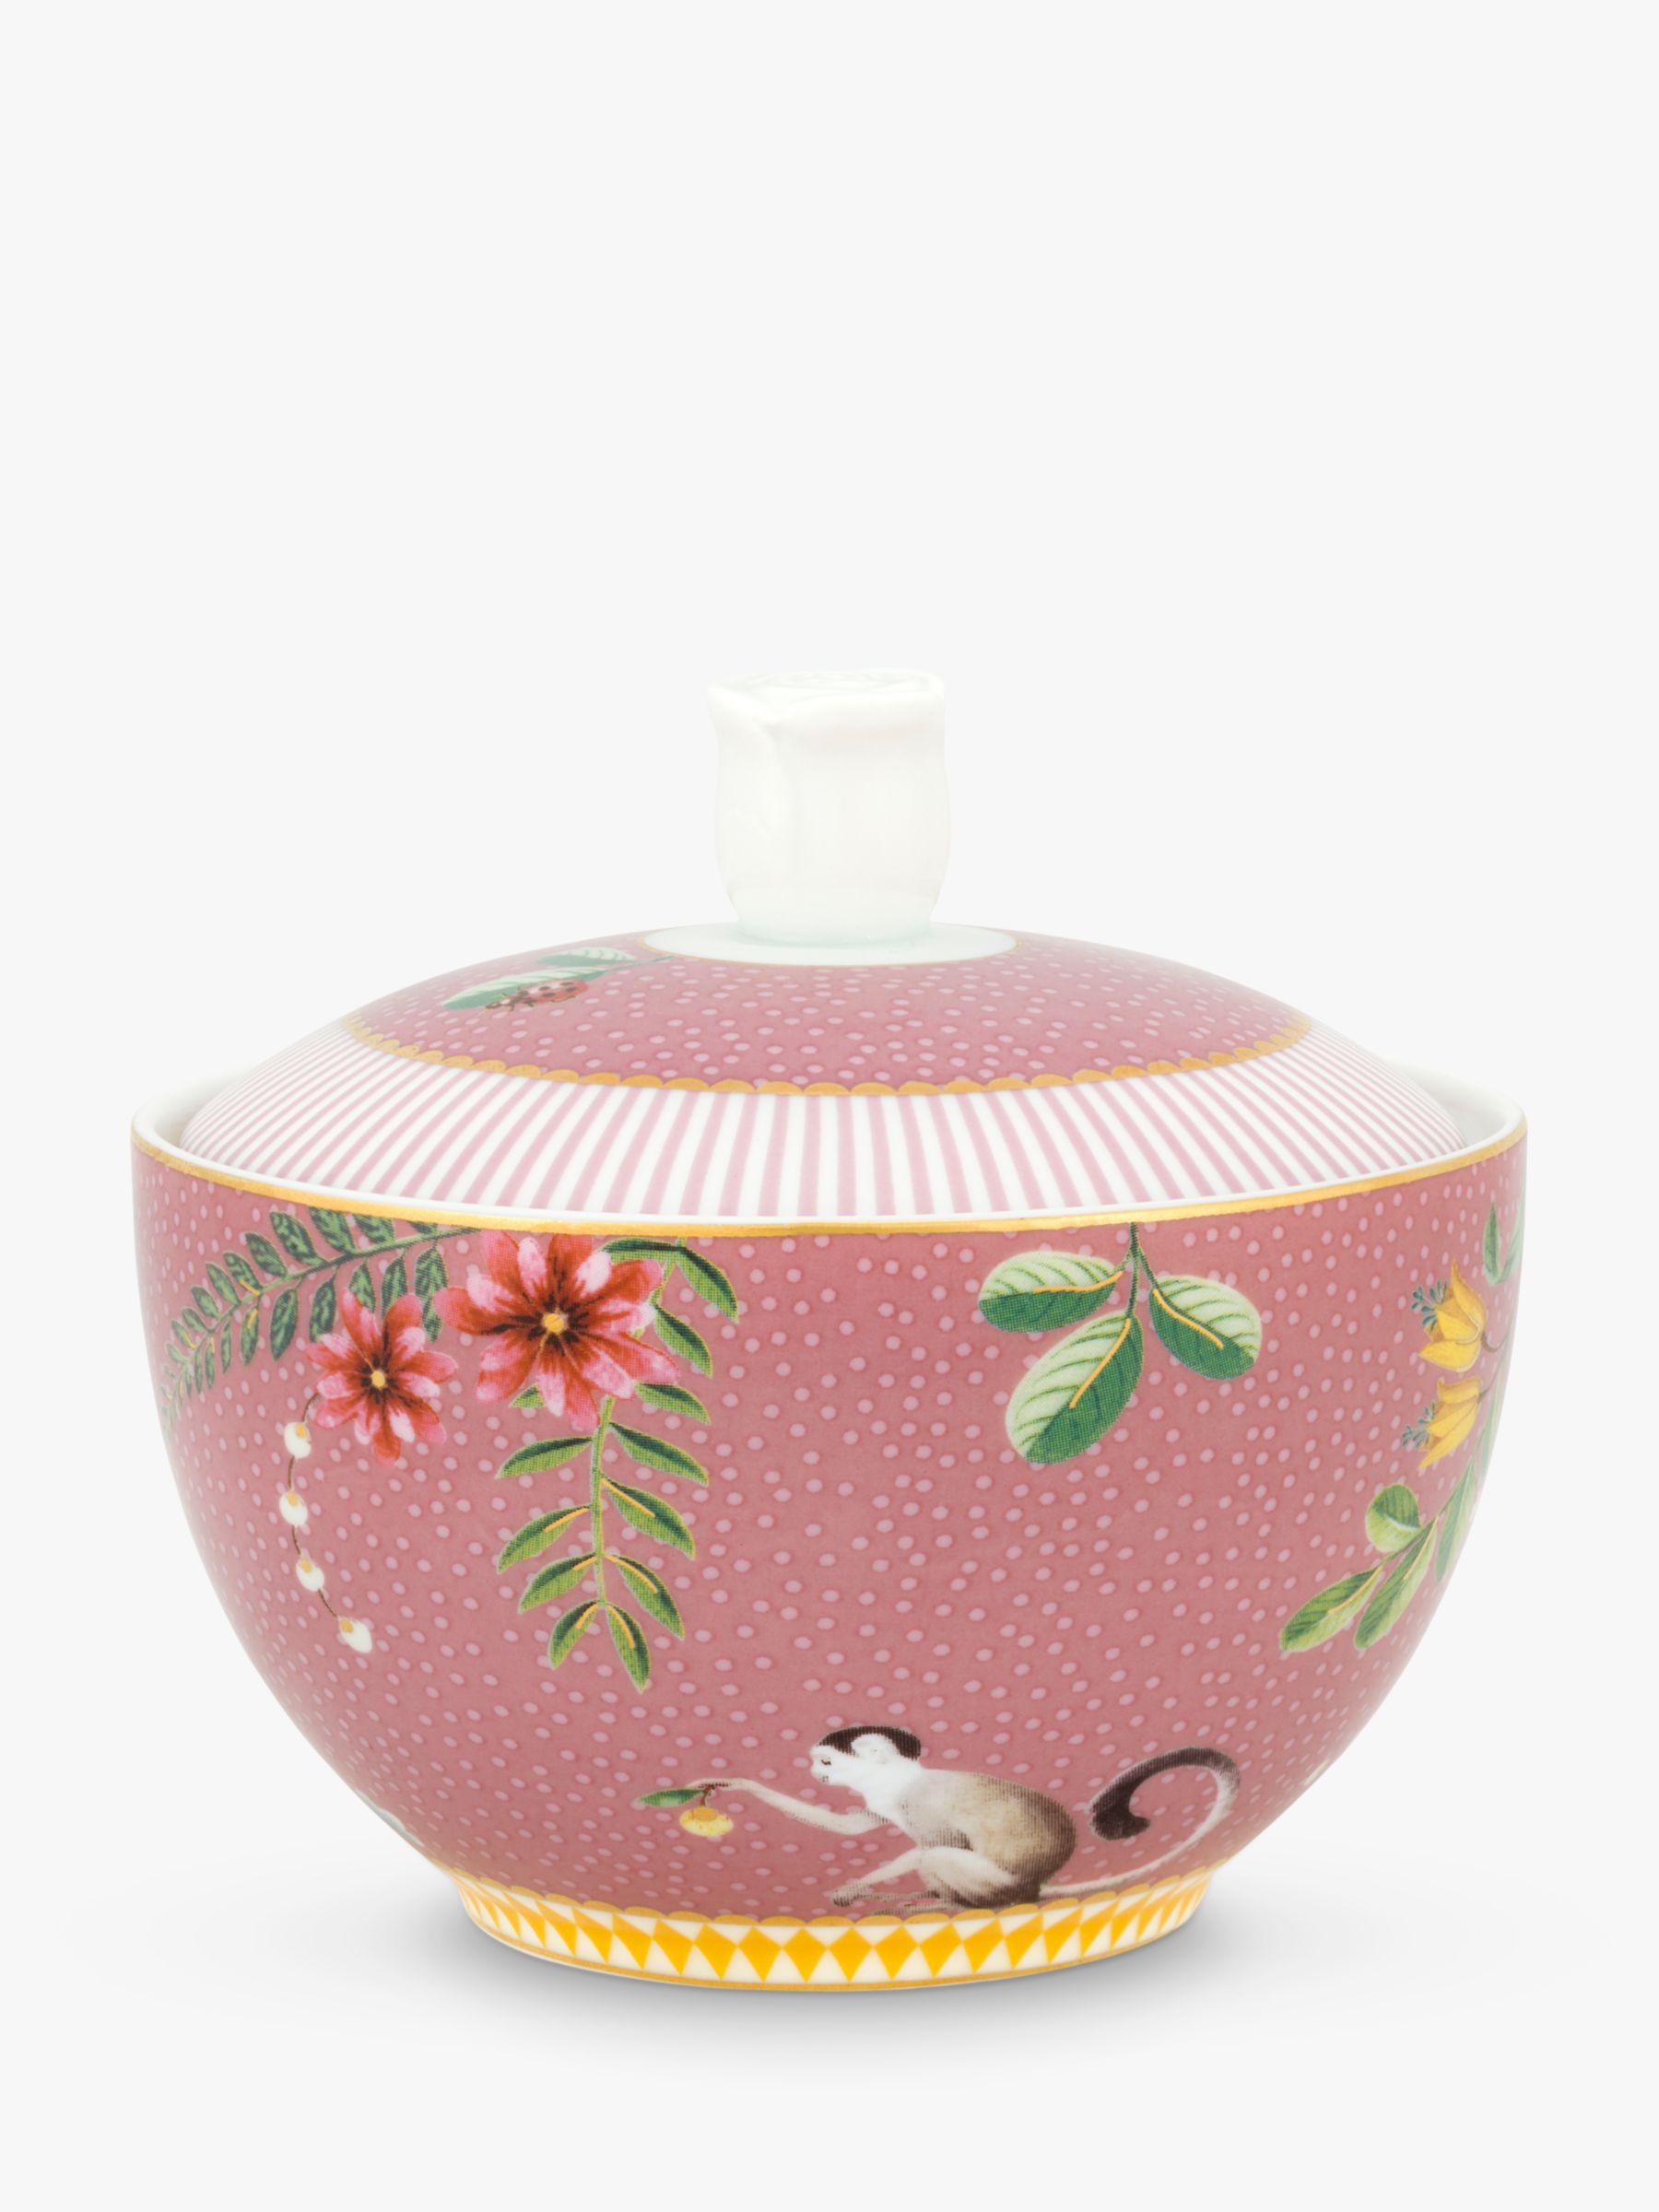 PiP Studio PiP Studio La Majorelle Sugar Bowl & Lid, 300ml, Pink